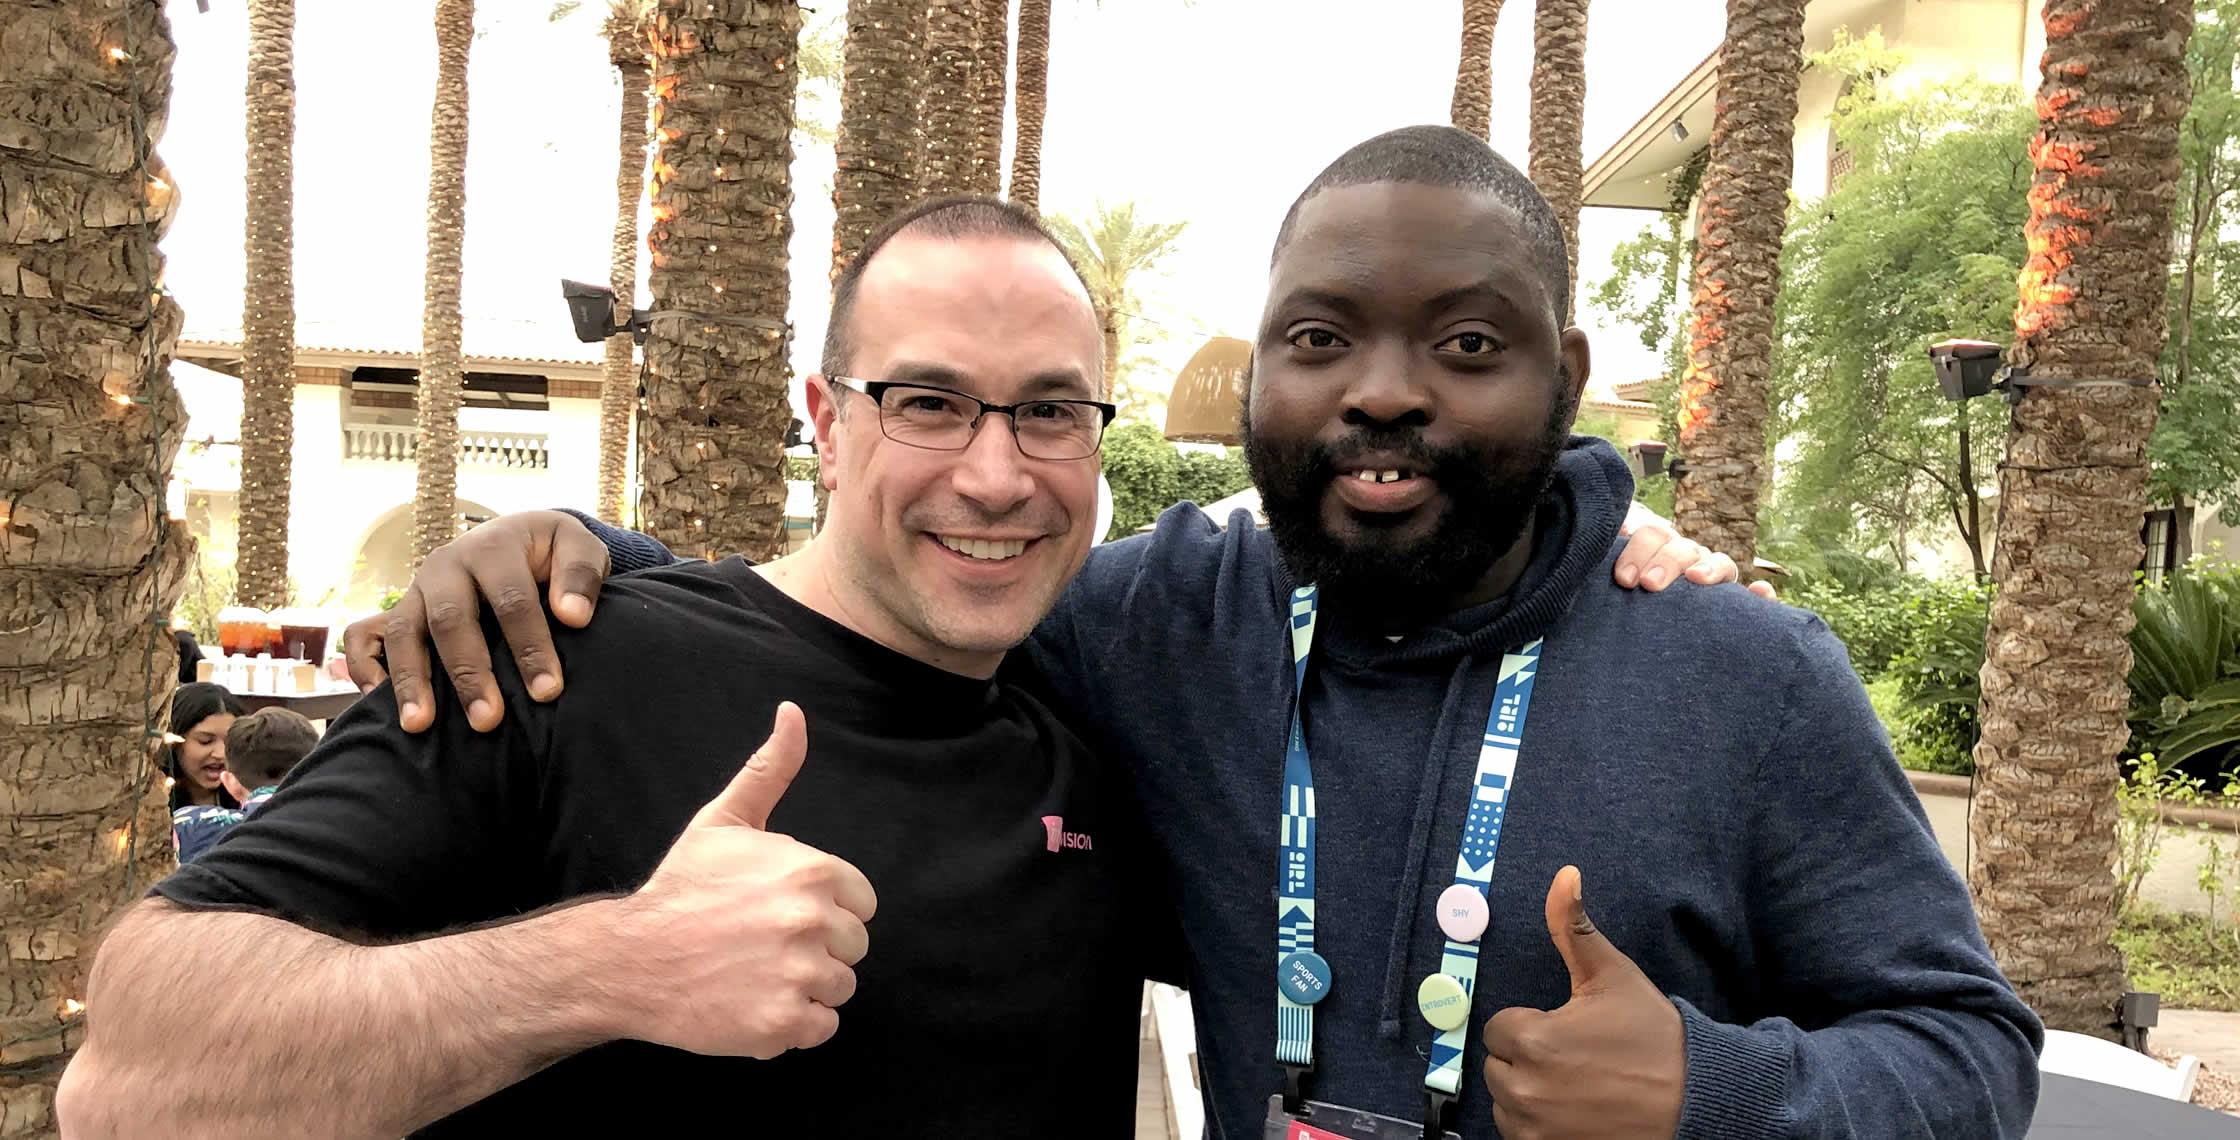 Ben Nadel at InVision In Real Life (IRL) 2019 (Phoenix, AZ) with: Azeez Olaniran